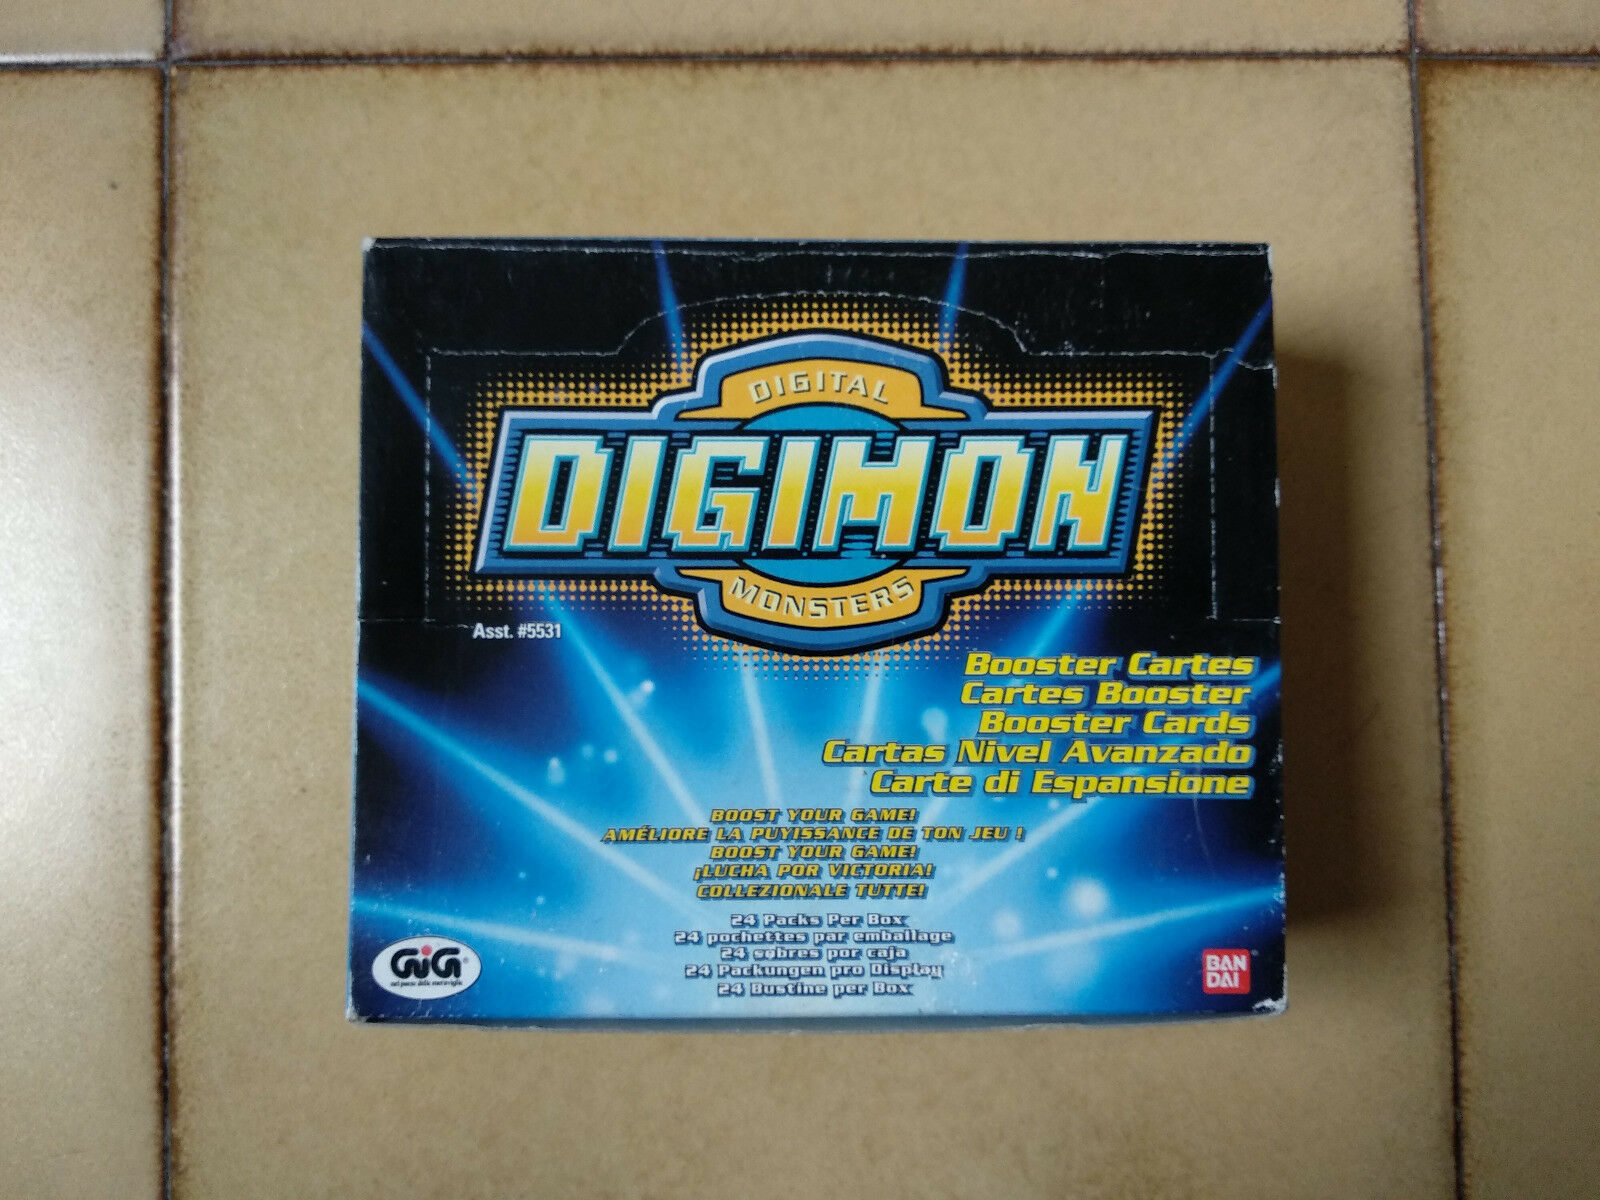 Digimon - - - Digi-Battle Card Game -  Series 1 - 24 booster BOX - df0724